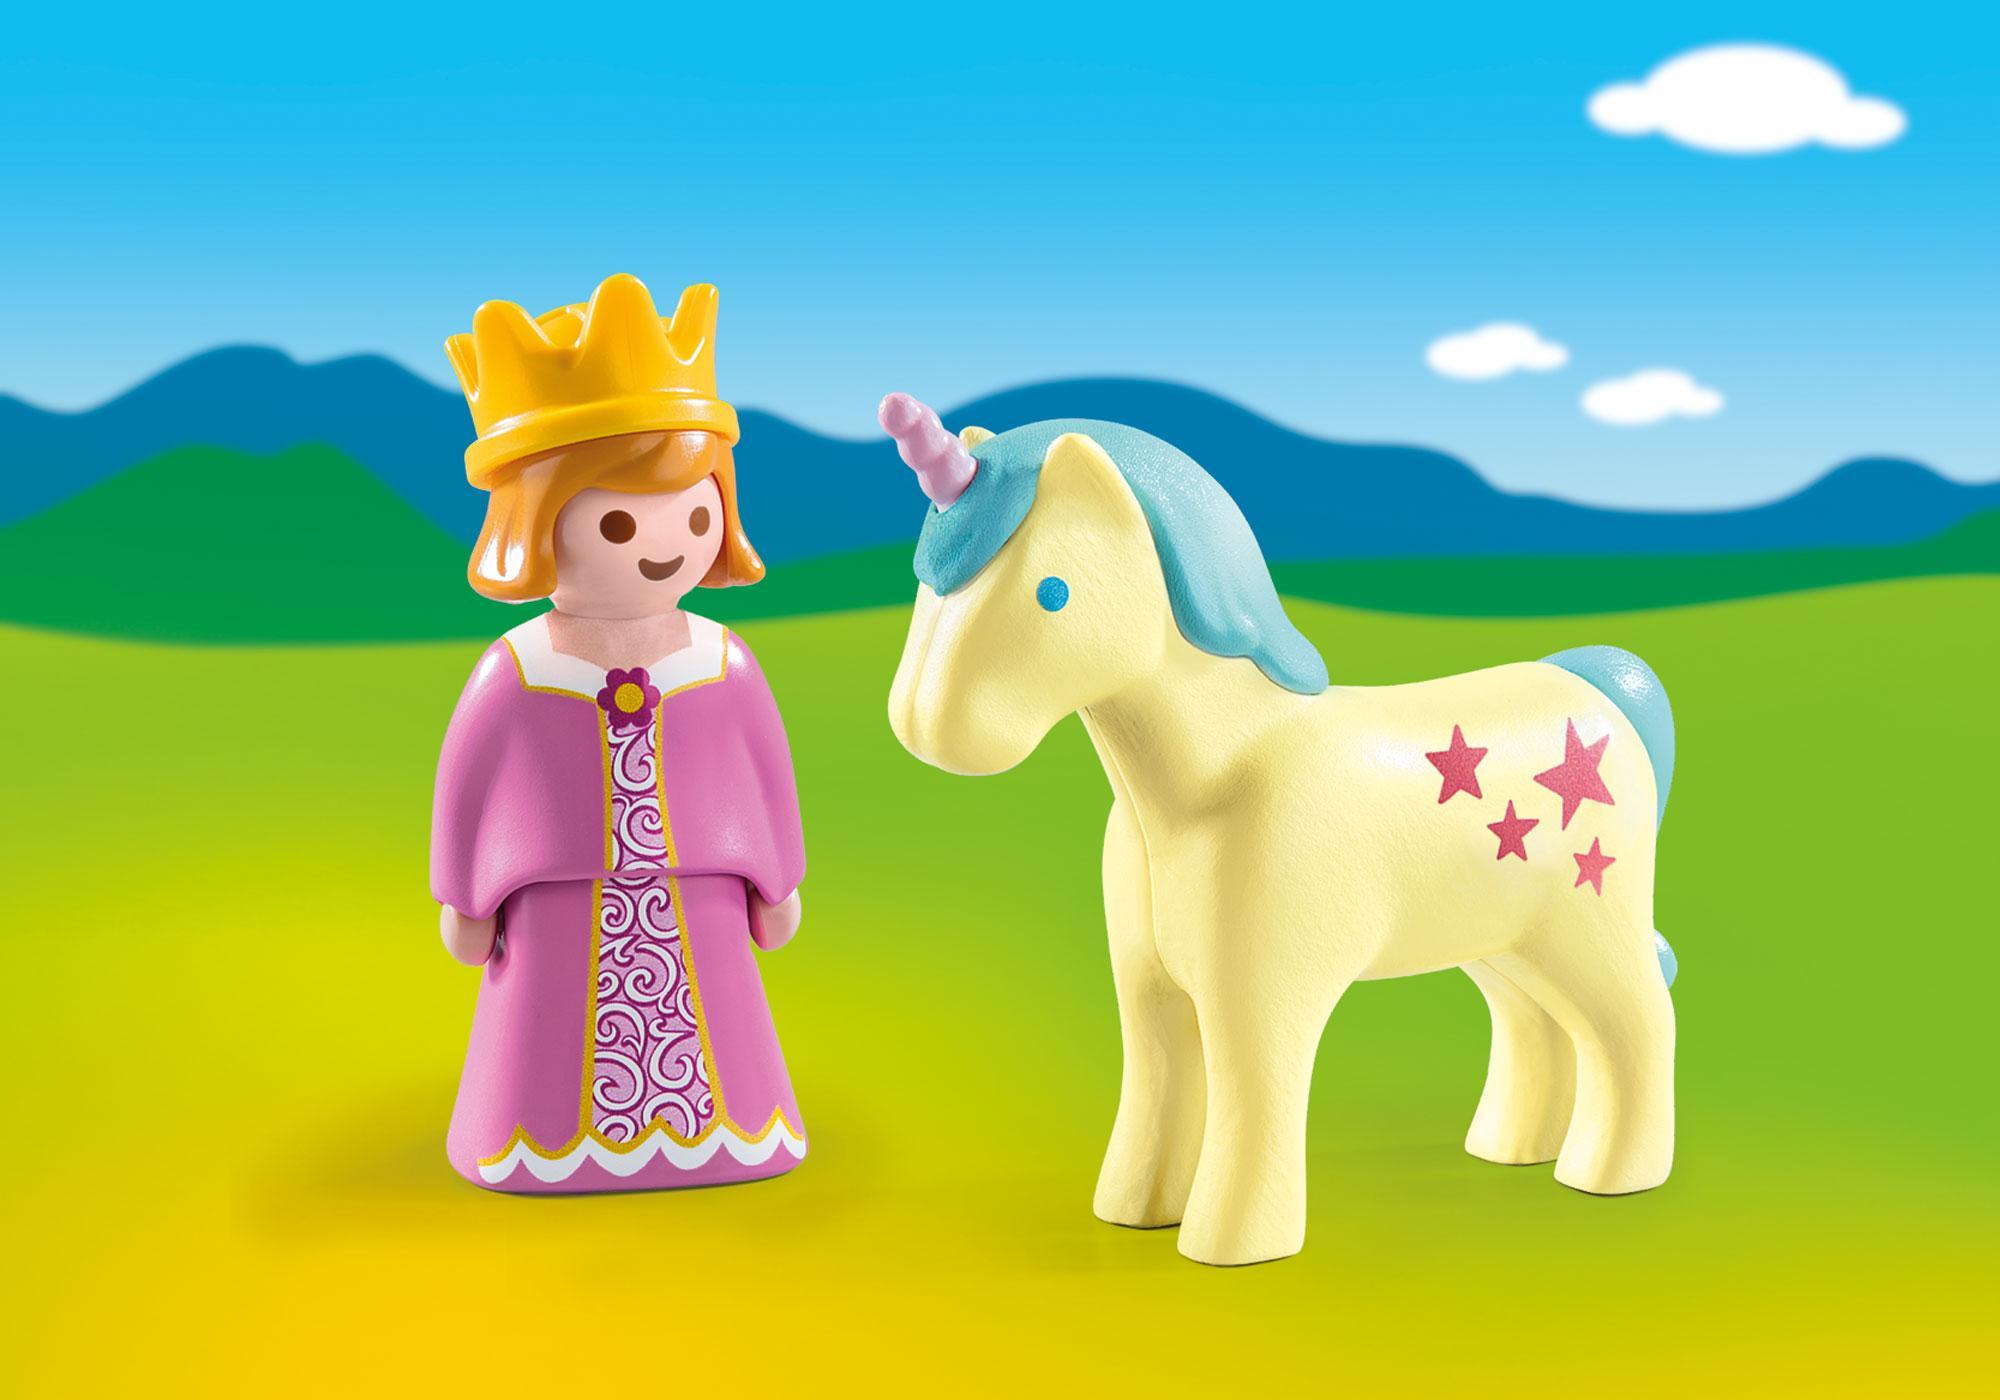 http://media.playmobil.com/i/playmobil/70127_product_detail/Prinzessin mit Einhorn